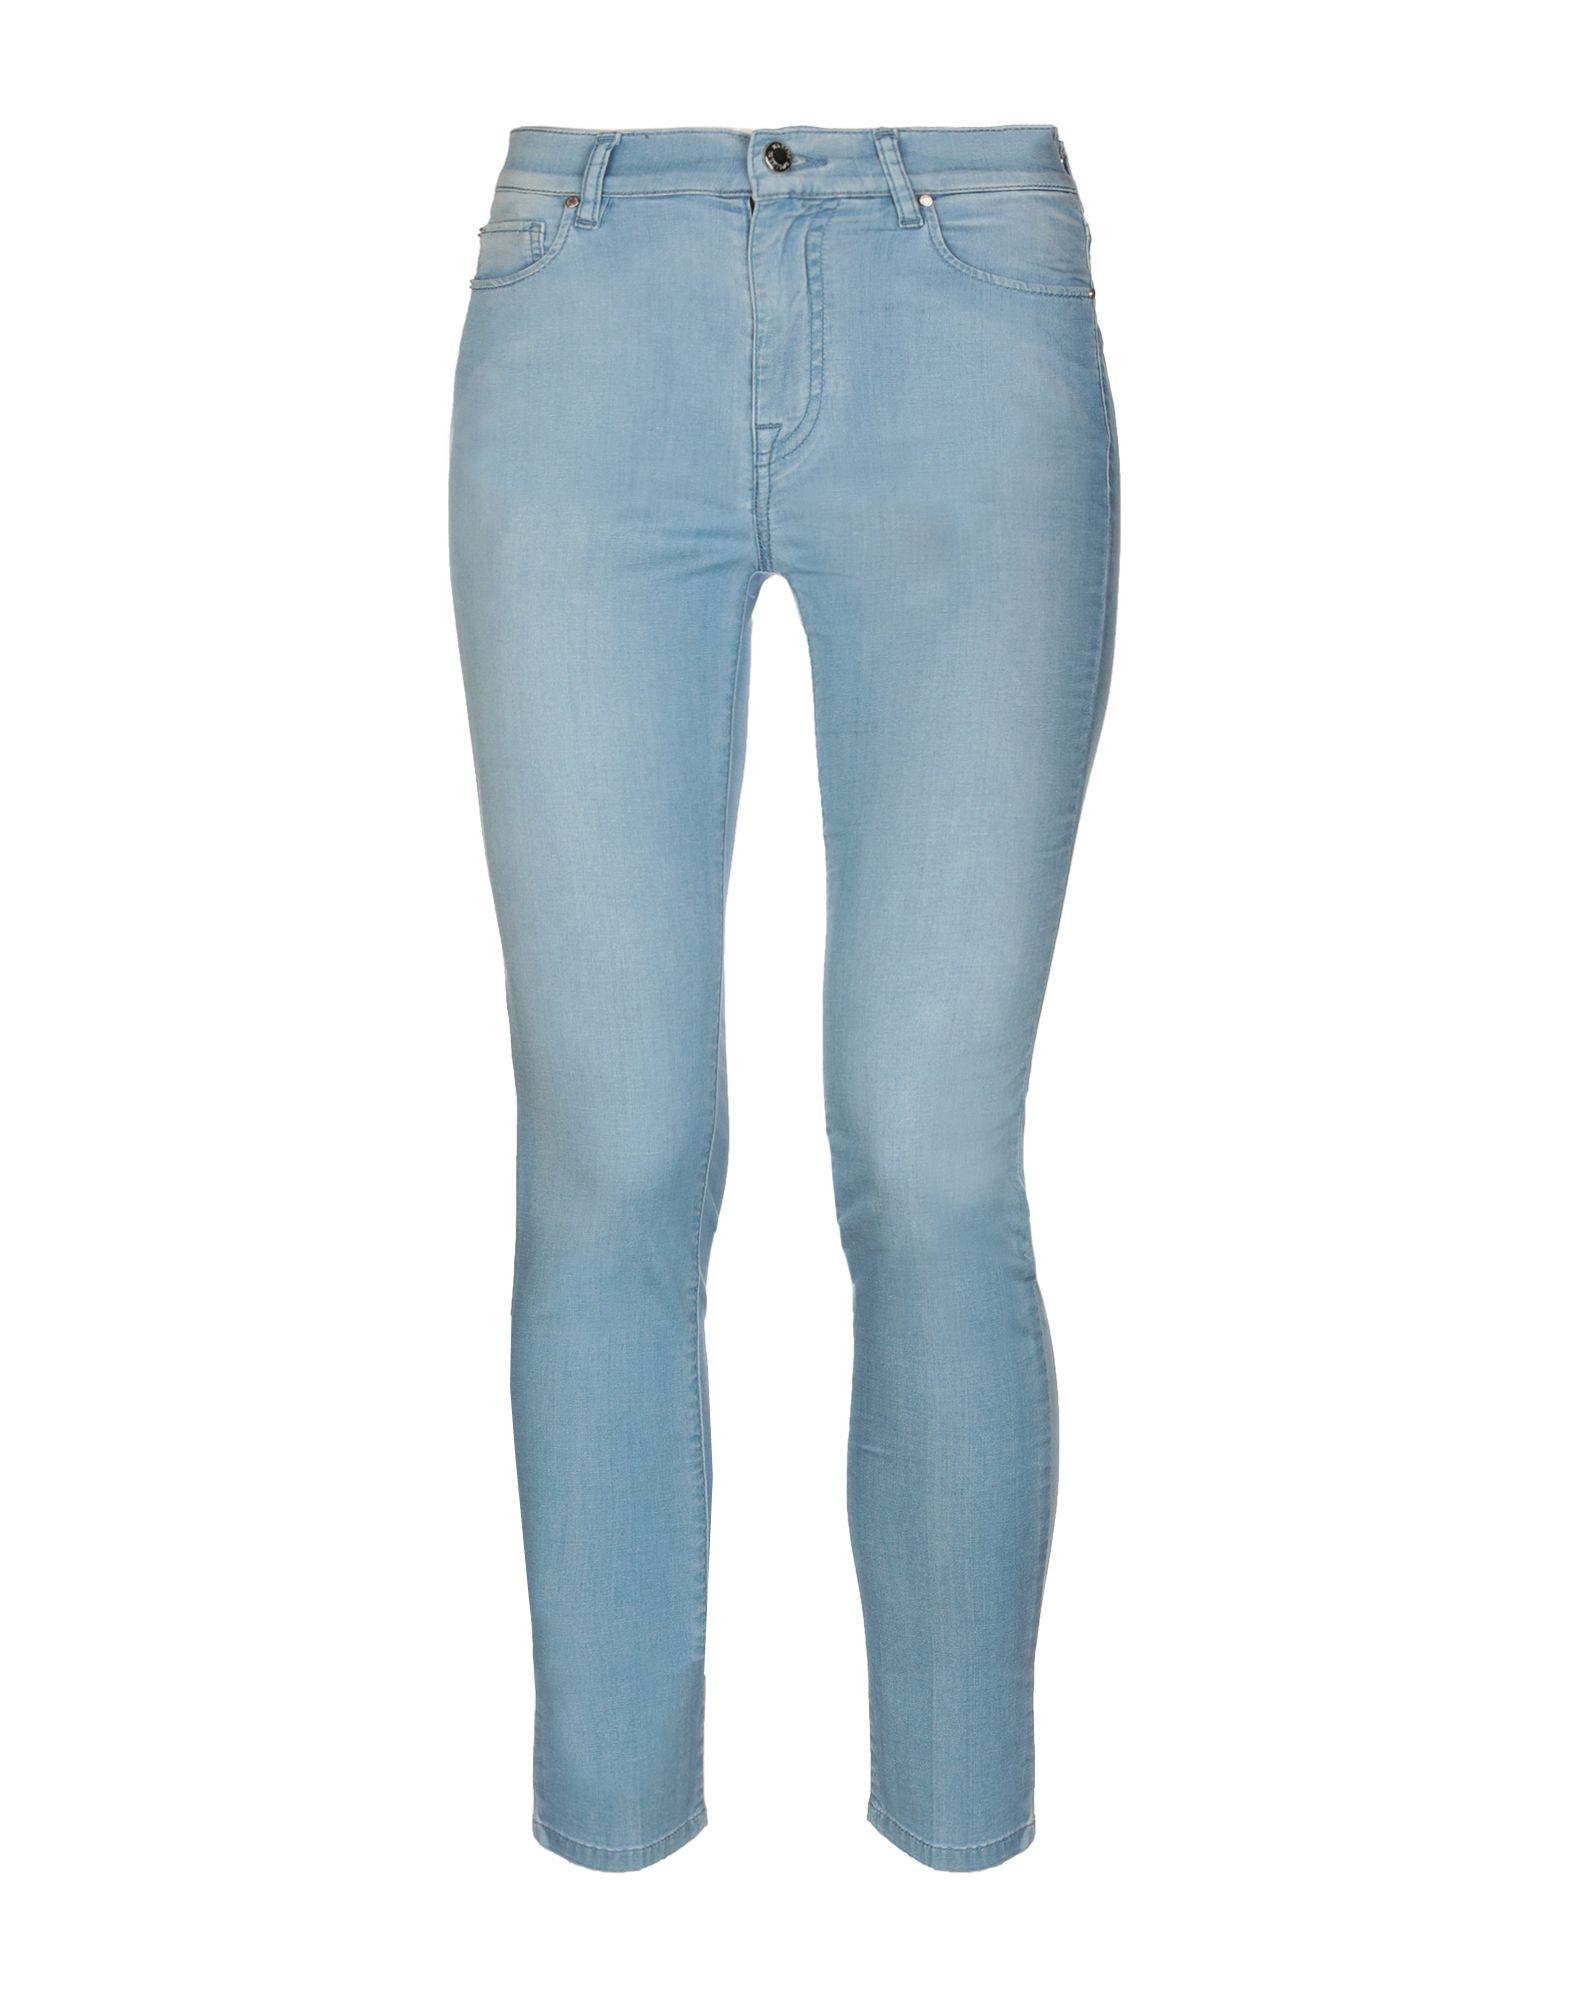 MARINA YACHTING Джинсовые брюки блуза marina yachting b1 028 58626 00 65023 092